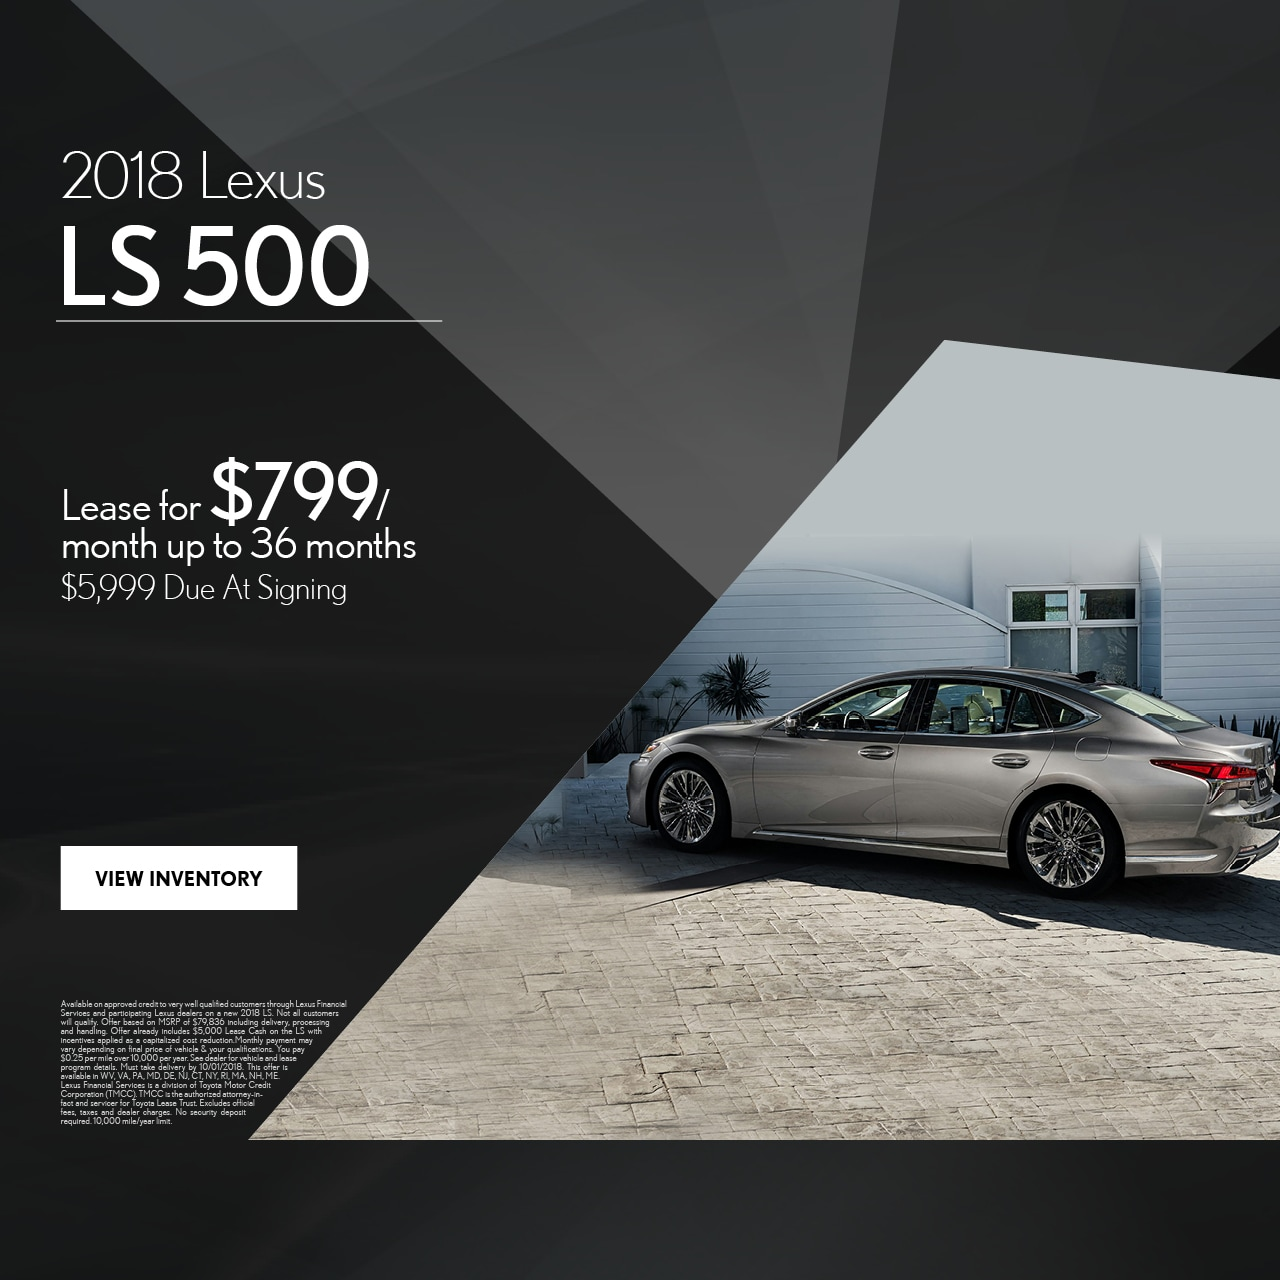 Lexus of richmond new lexus dealership in richmond va 23235 previous next solutioingenieria Image collections